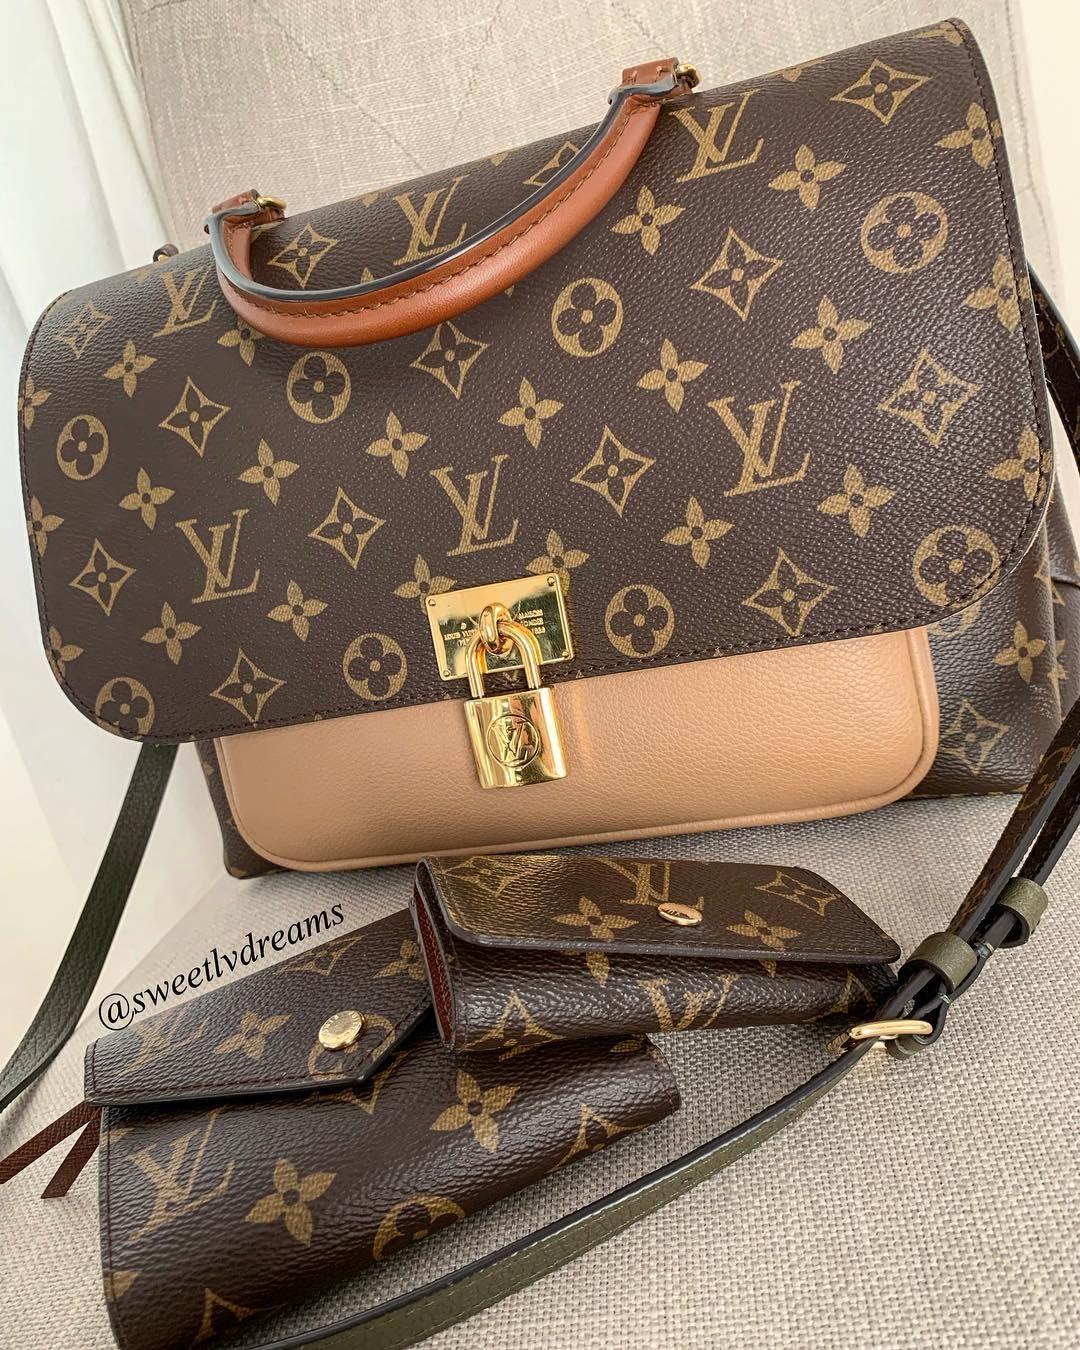 e88096e2c11d 𝓈𝒶𝓋𝒶𝓃𝓃𝒶𝒽 𝓂𝒶𝒹𝒾𝓈𝑜𝓃 𝓍      louisvuittonhandbags ...